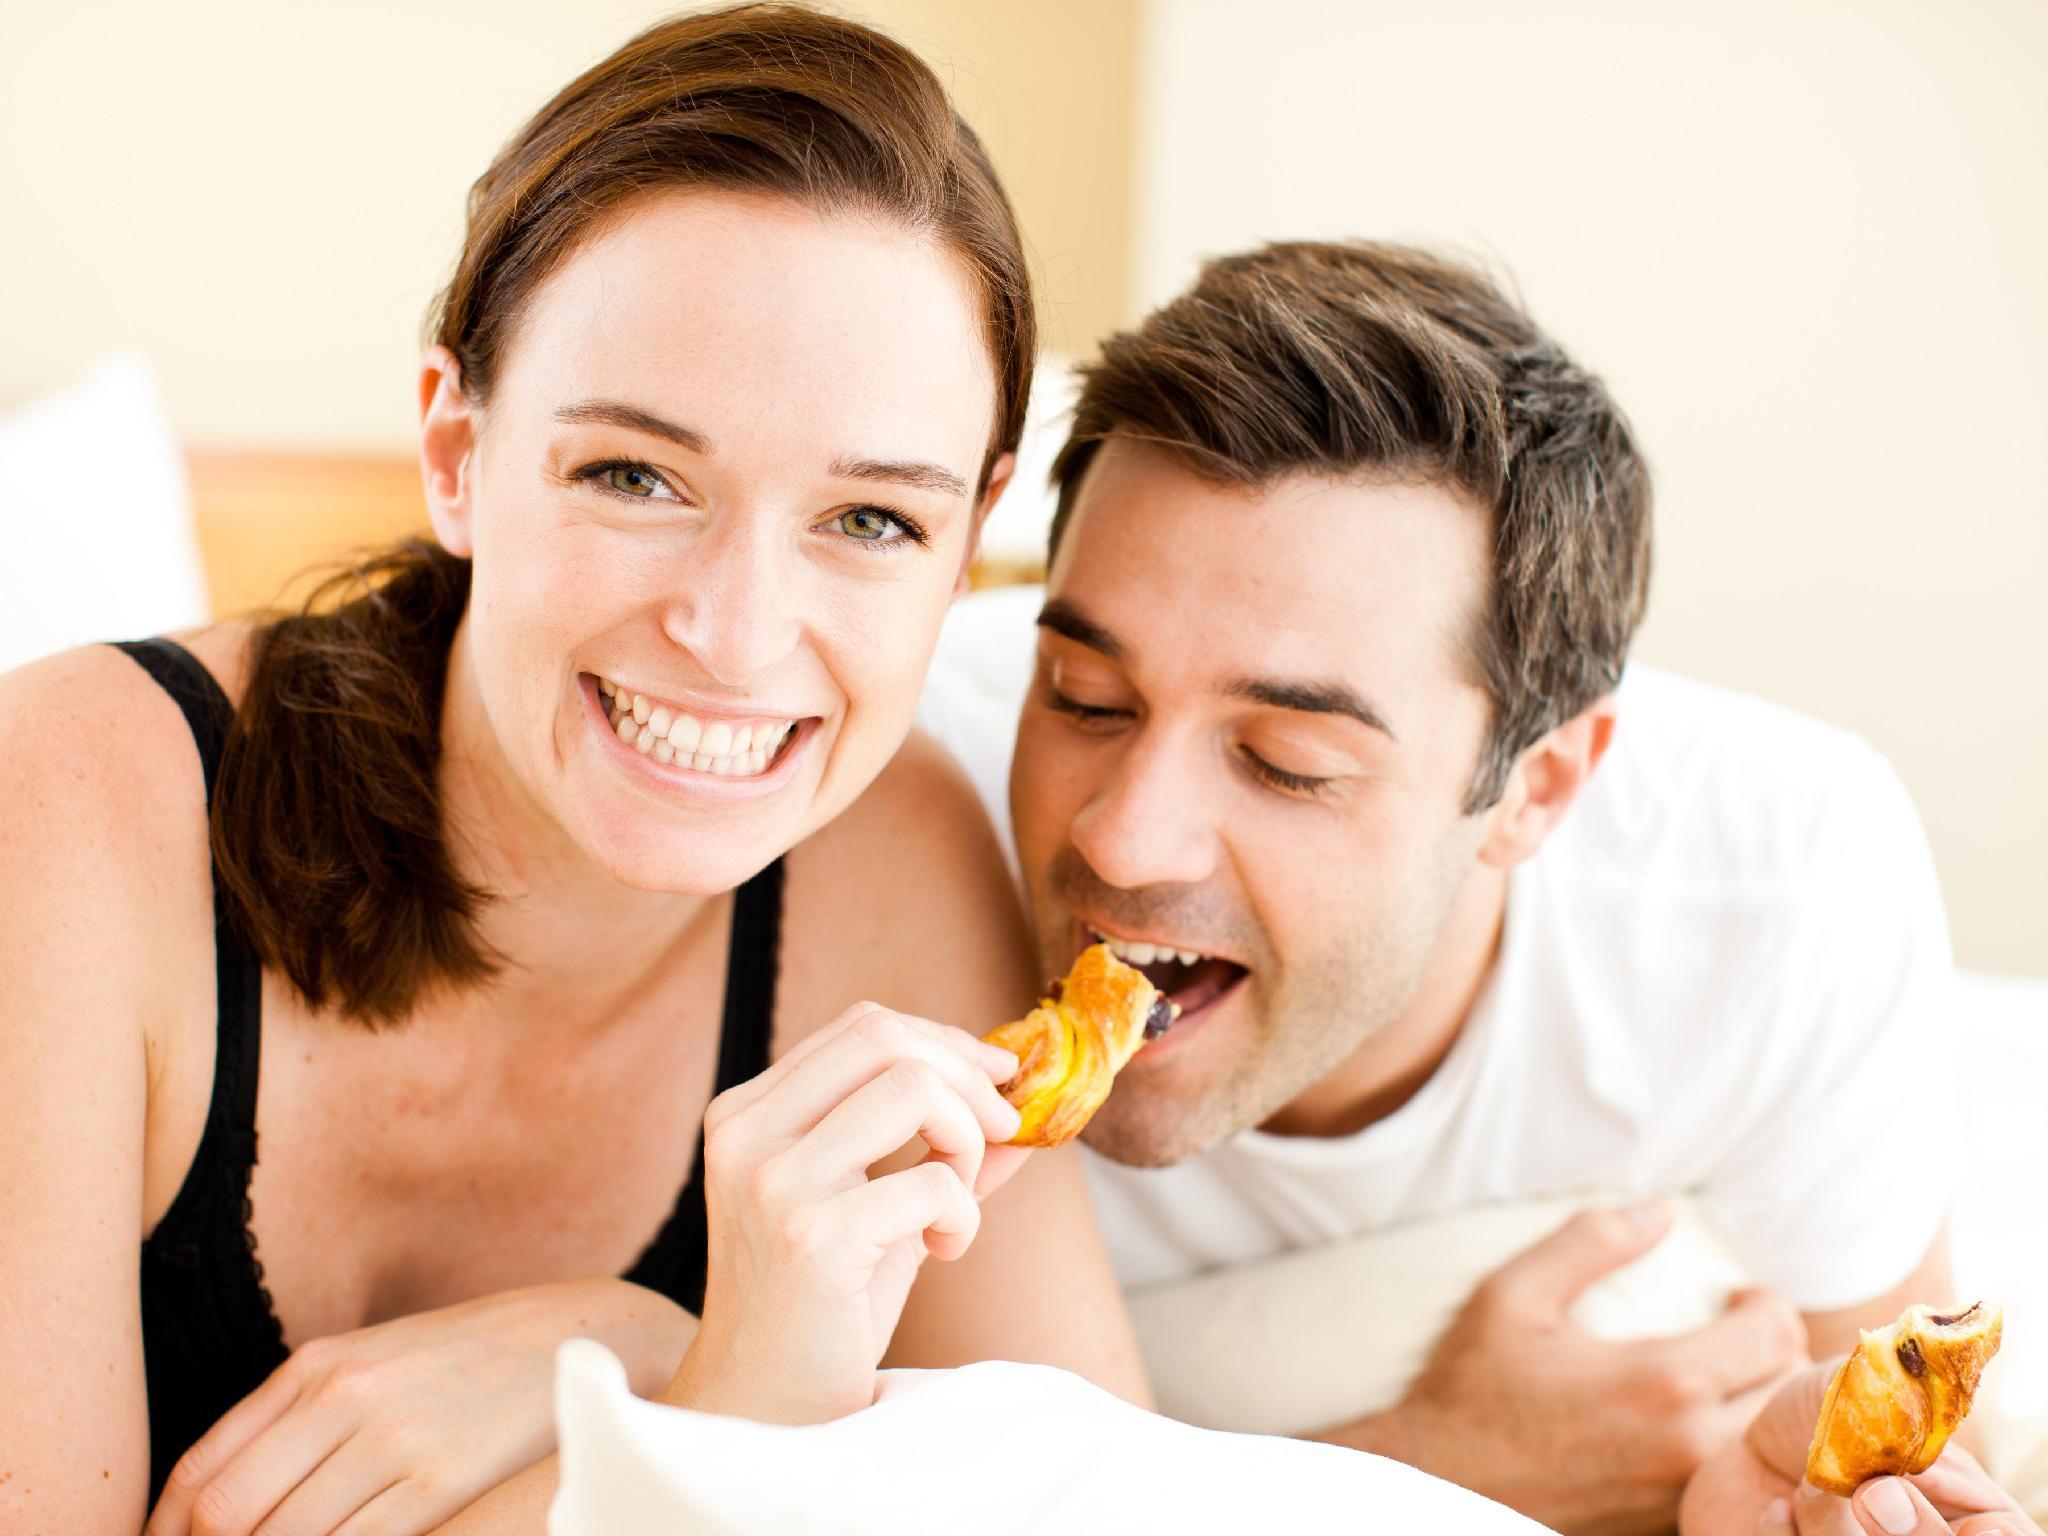 Miten tulla dating valmentaja